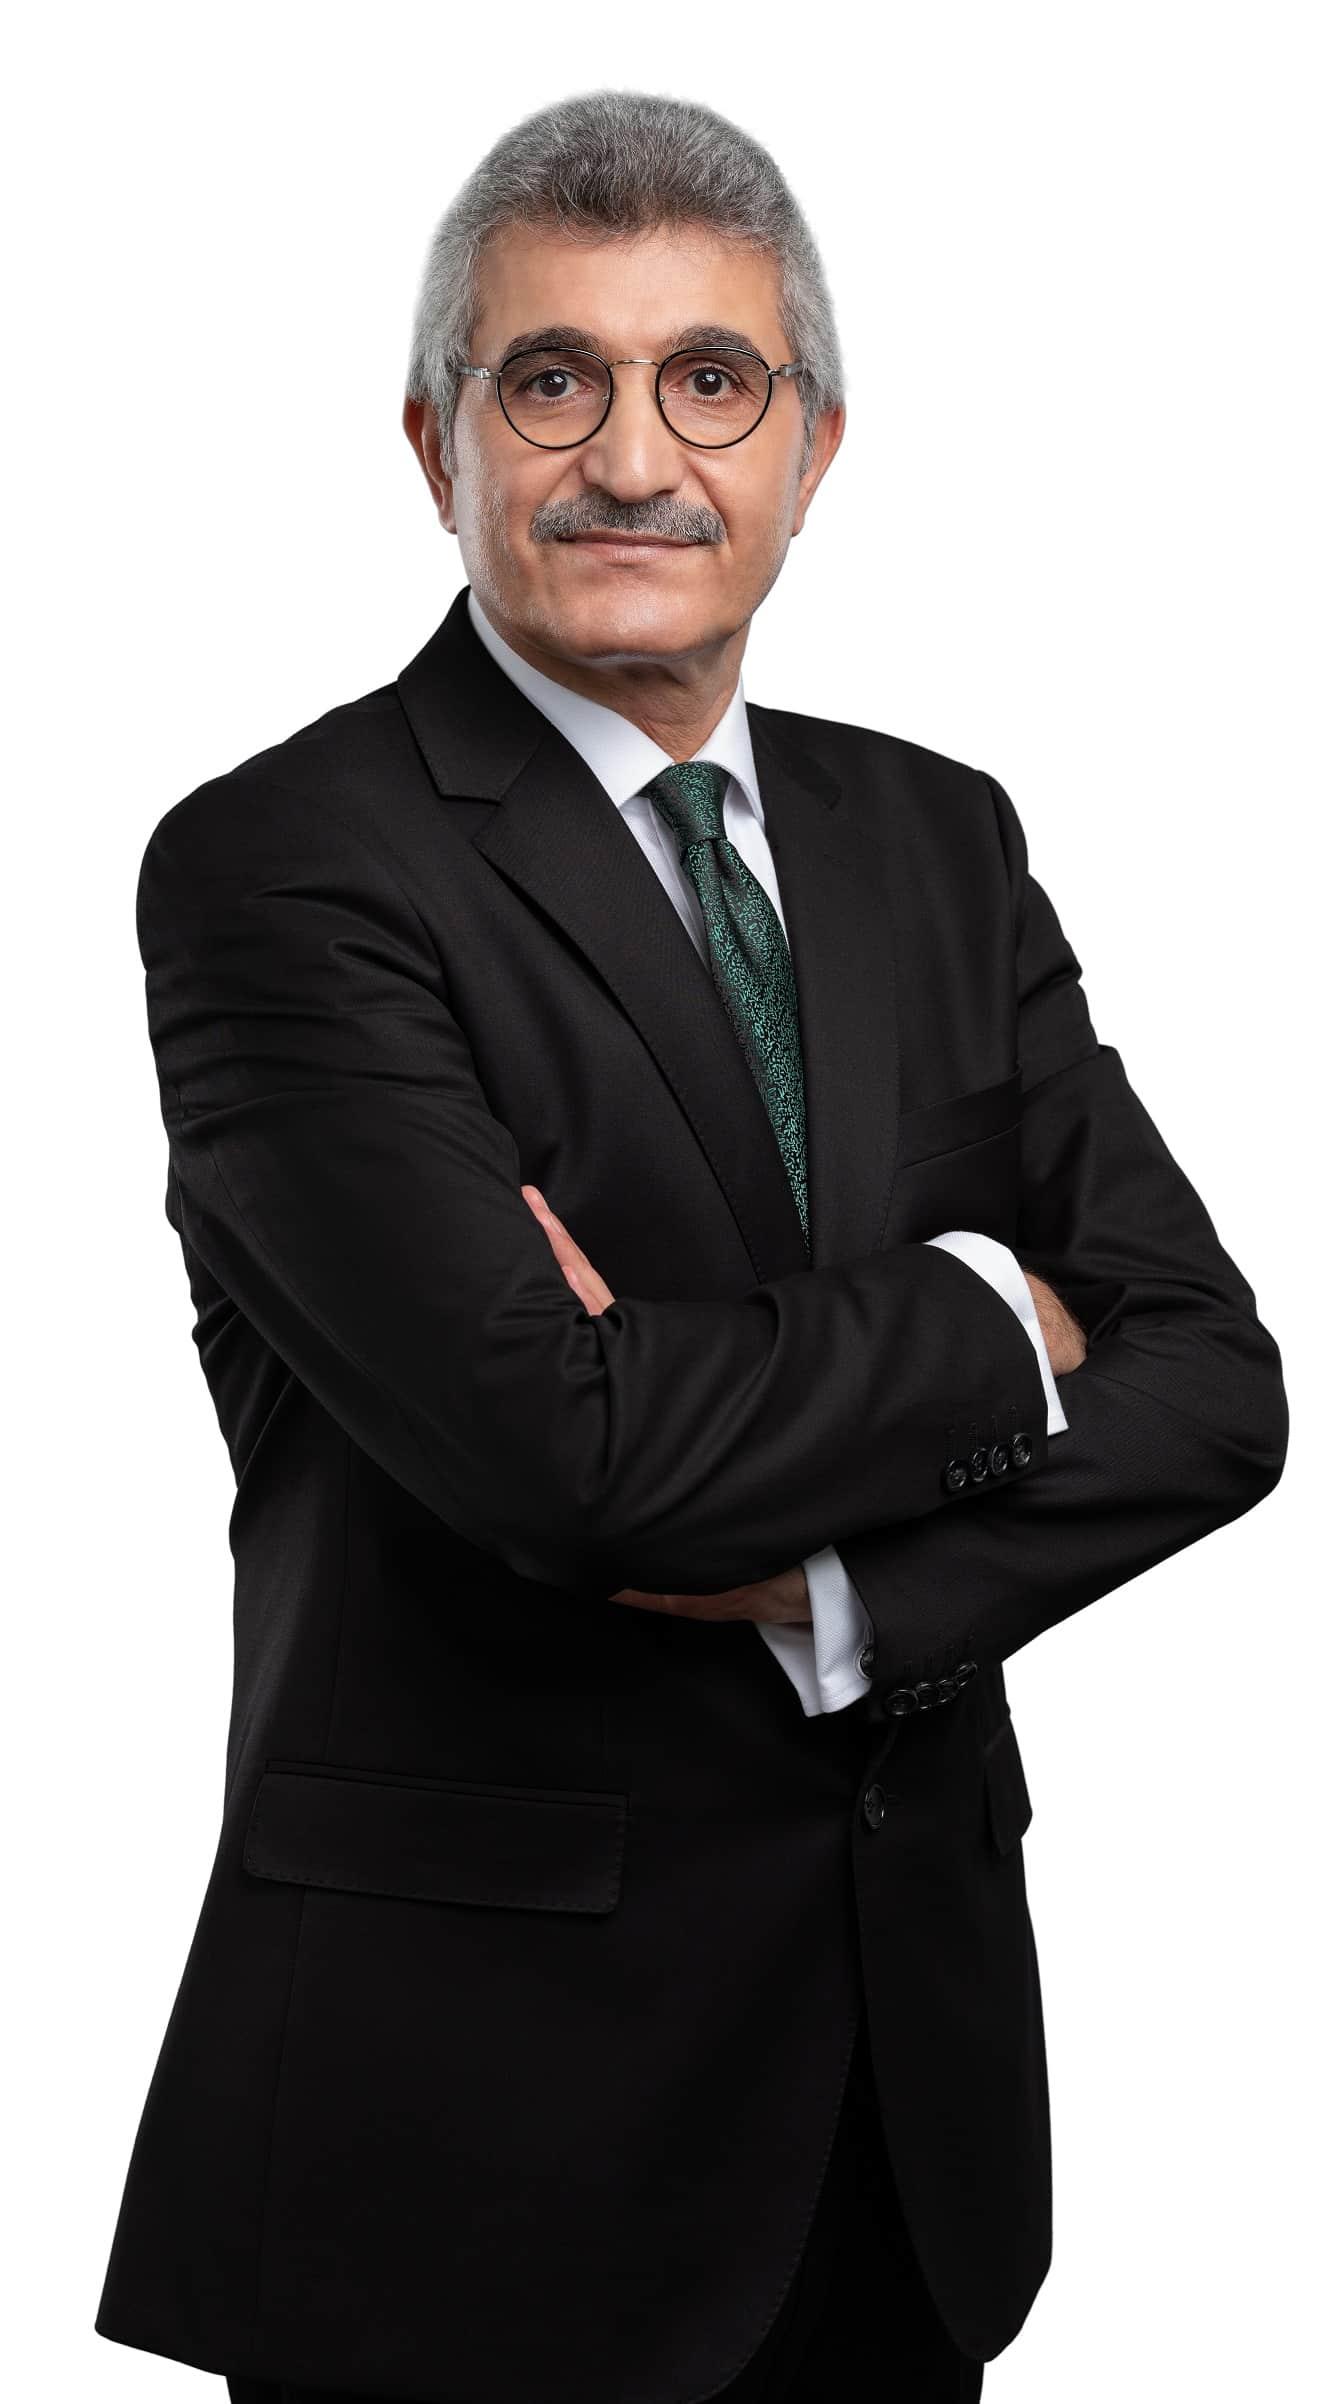 Dr. Kais Alalgawi